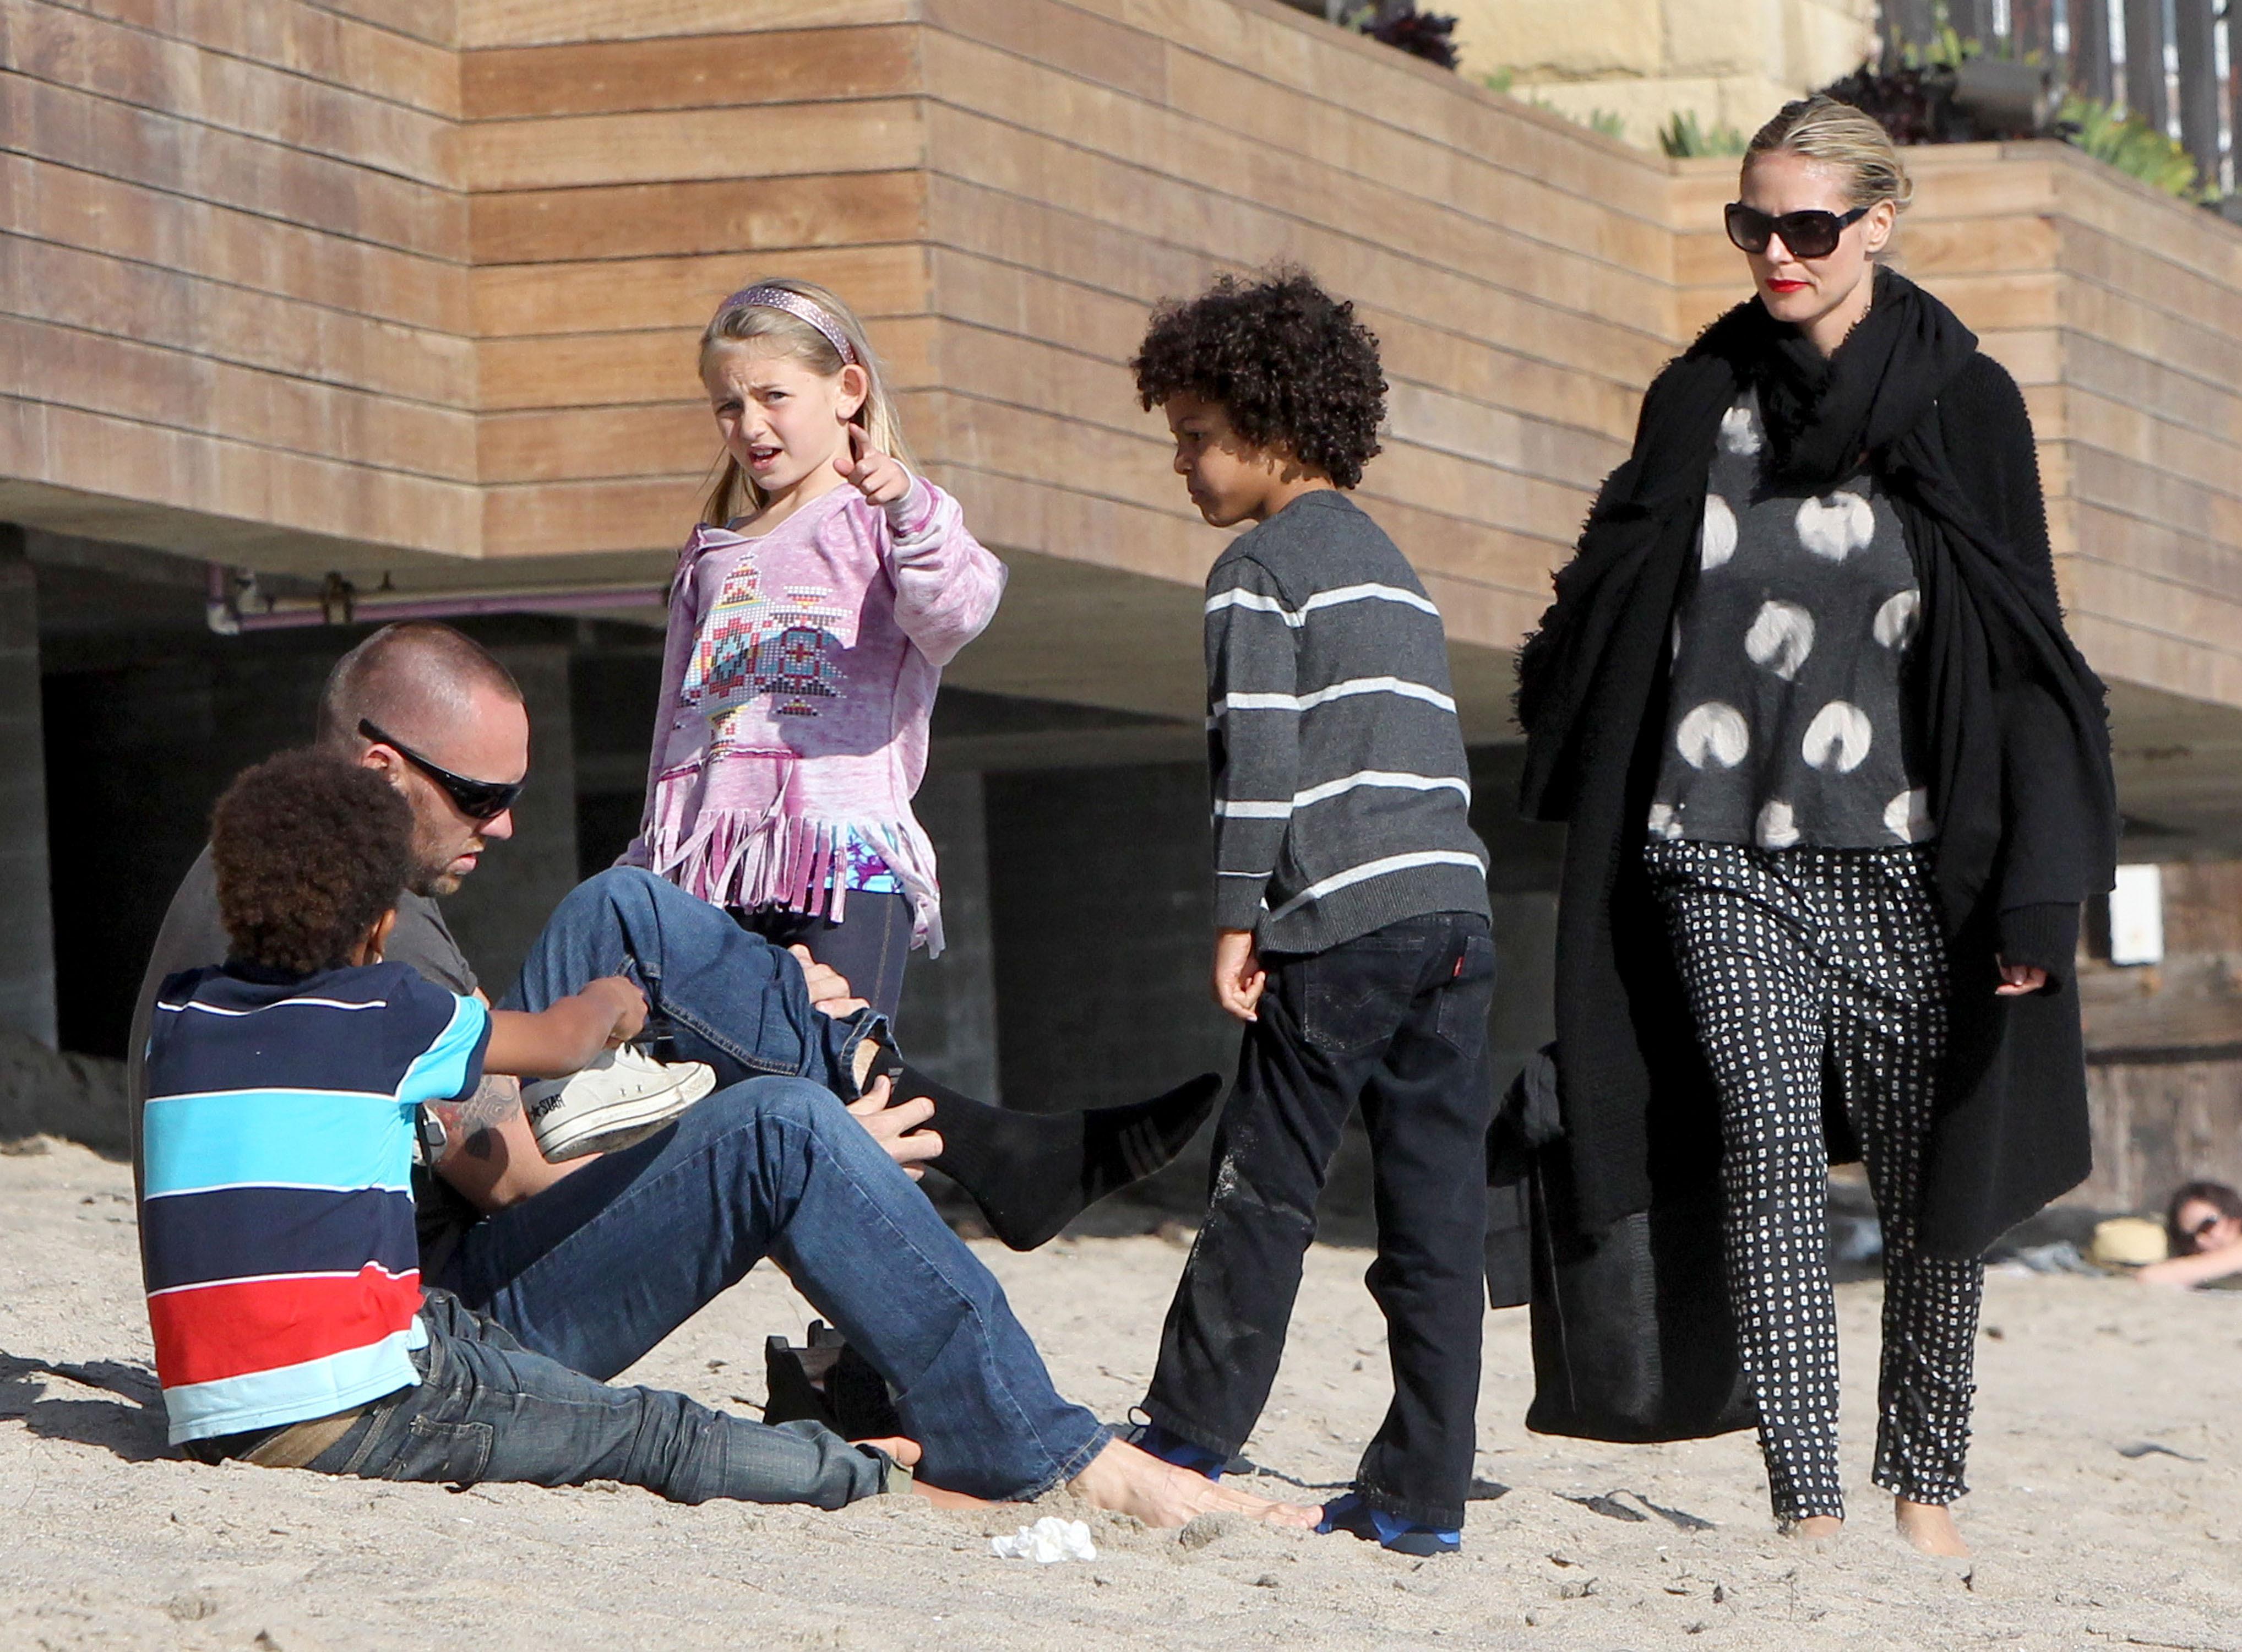 Heidi Klum Martin Kristen beach kids